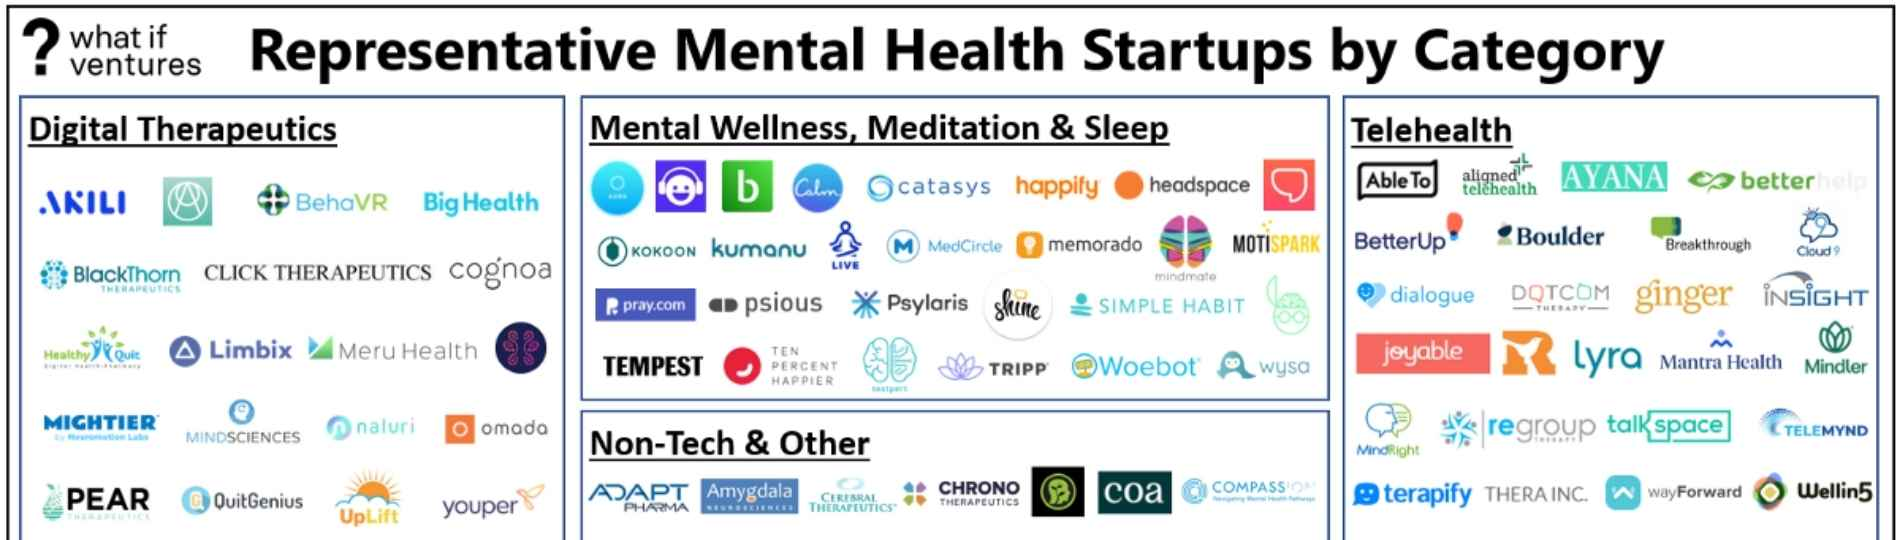 Mental heath start-ups